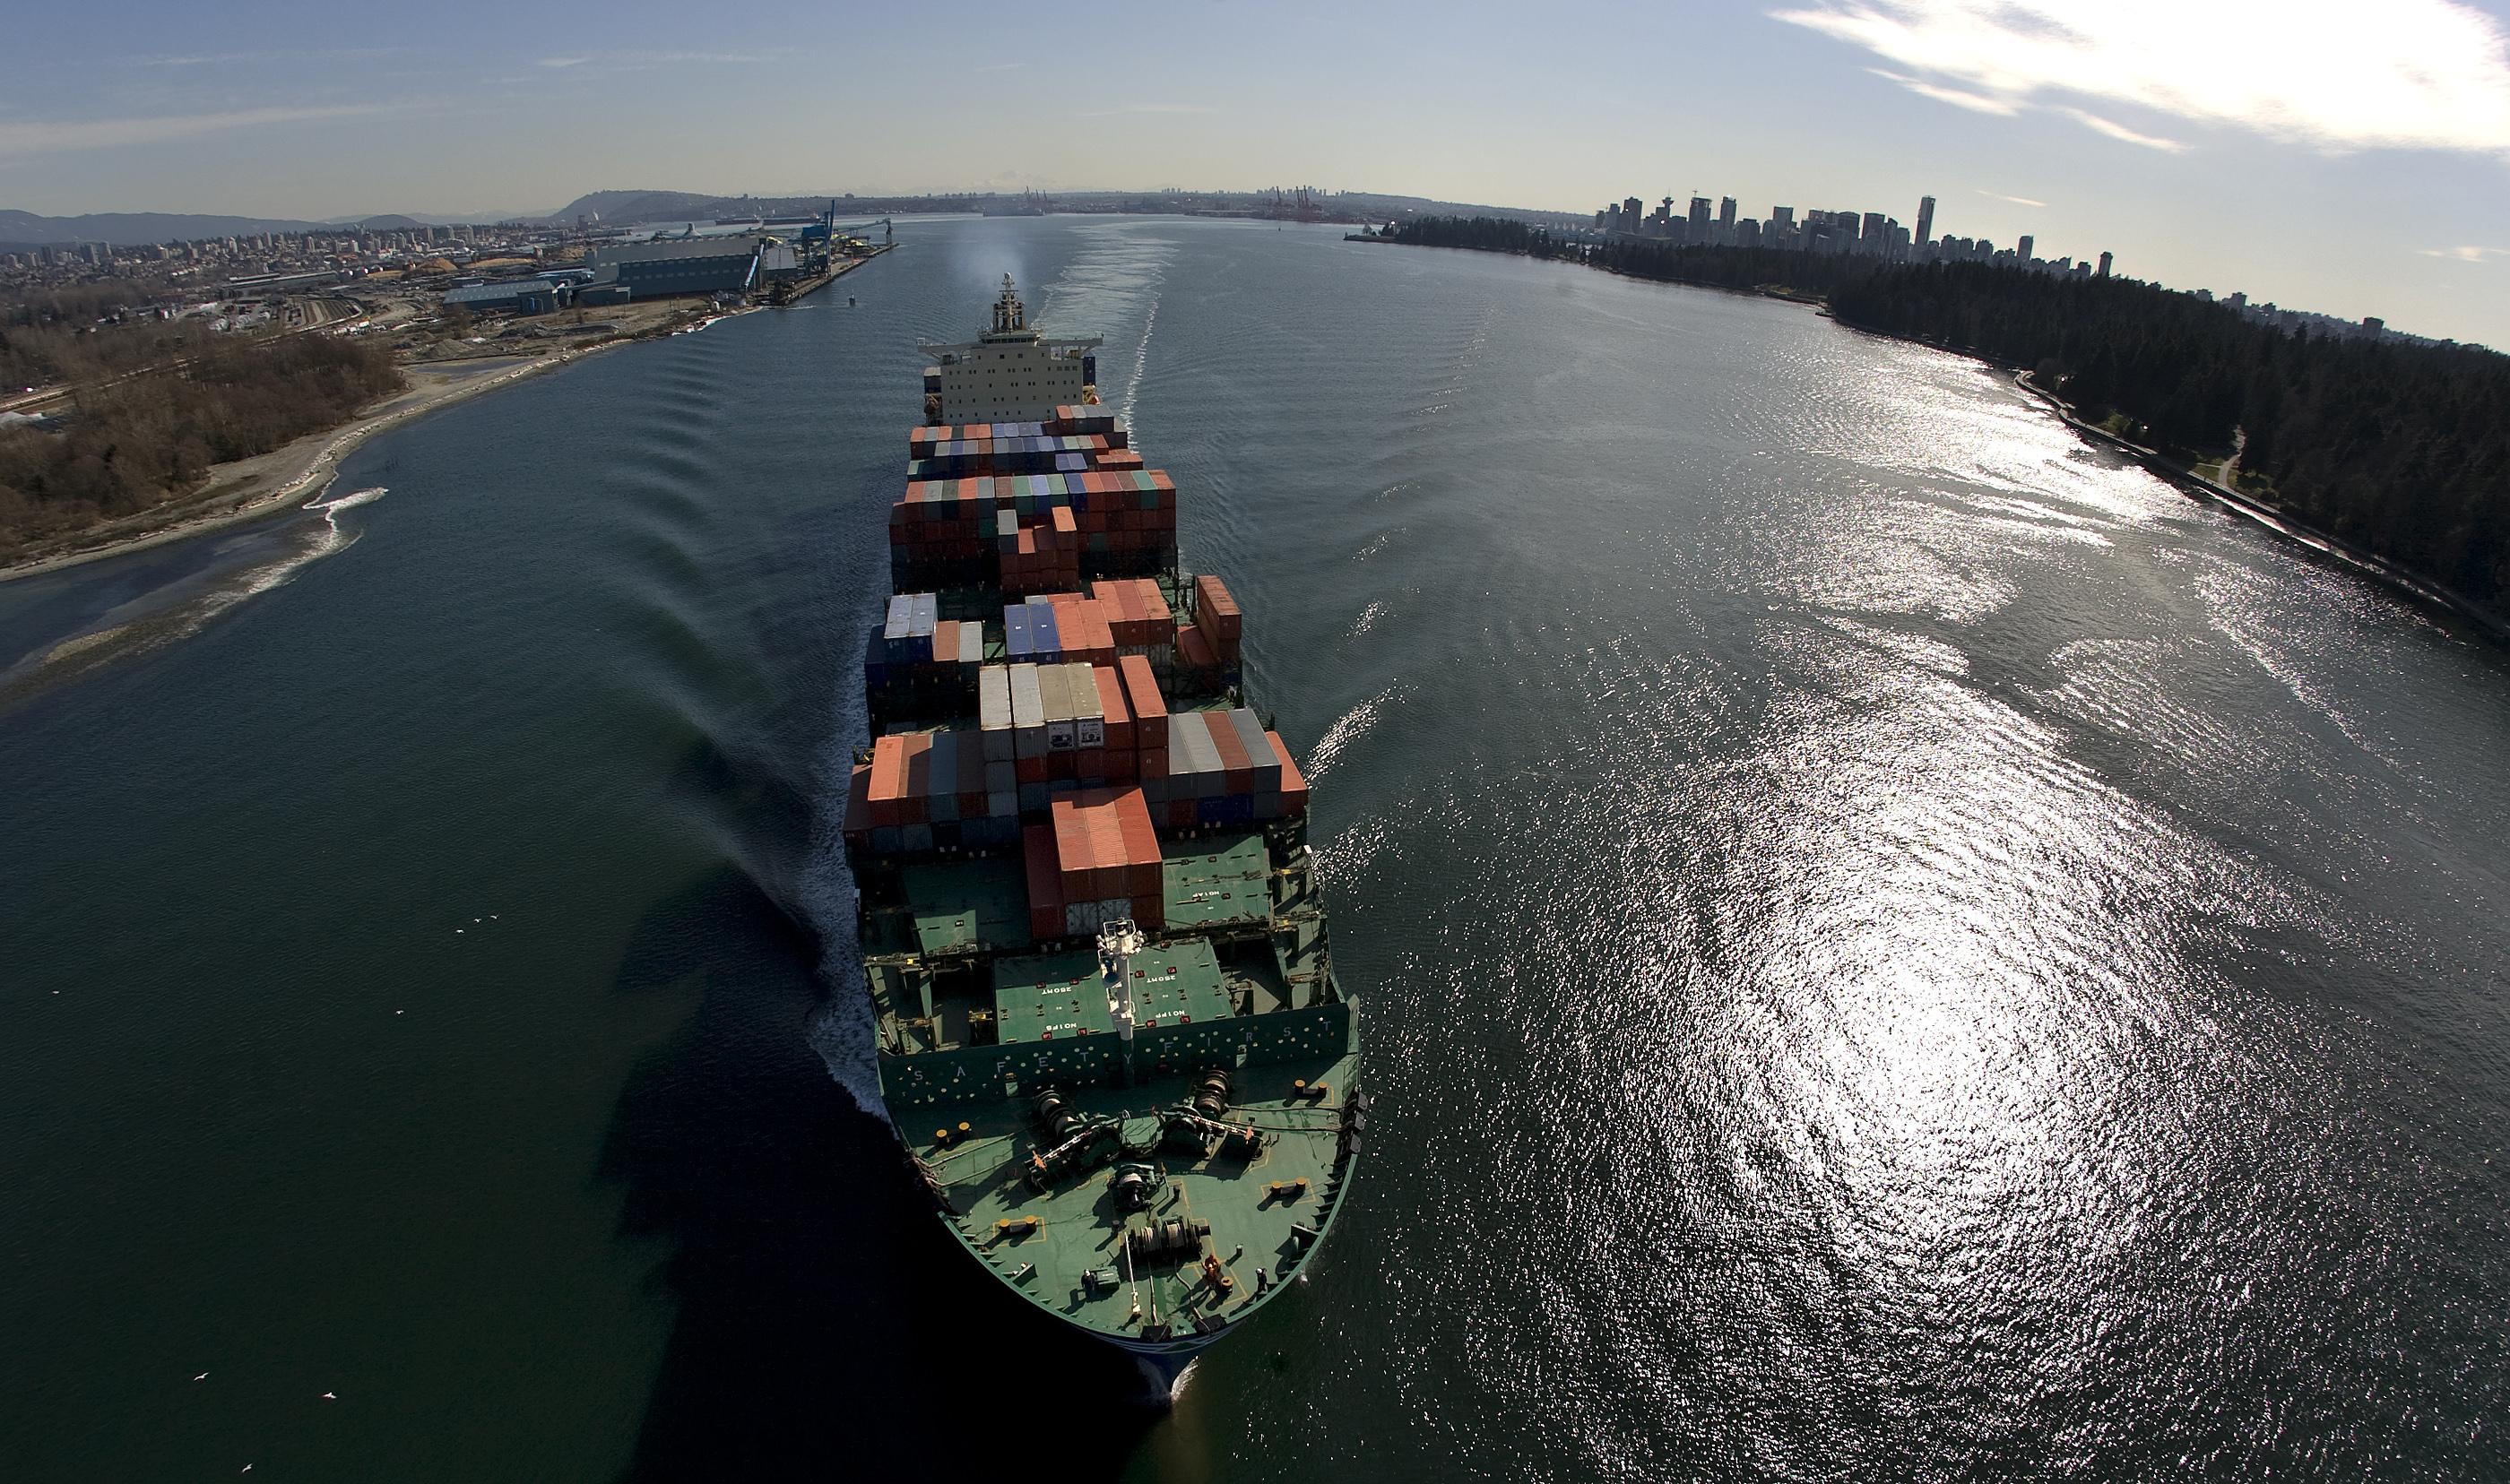 Metro freight series: Global goods trade and metropolitan economies